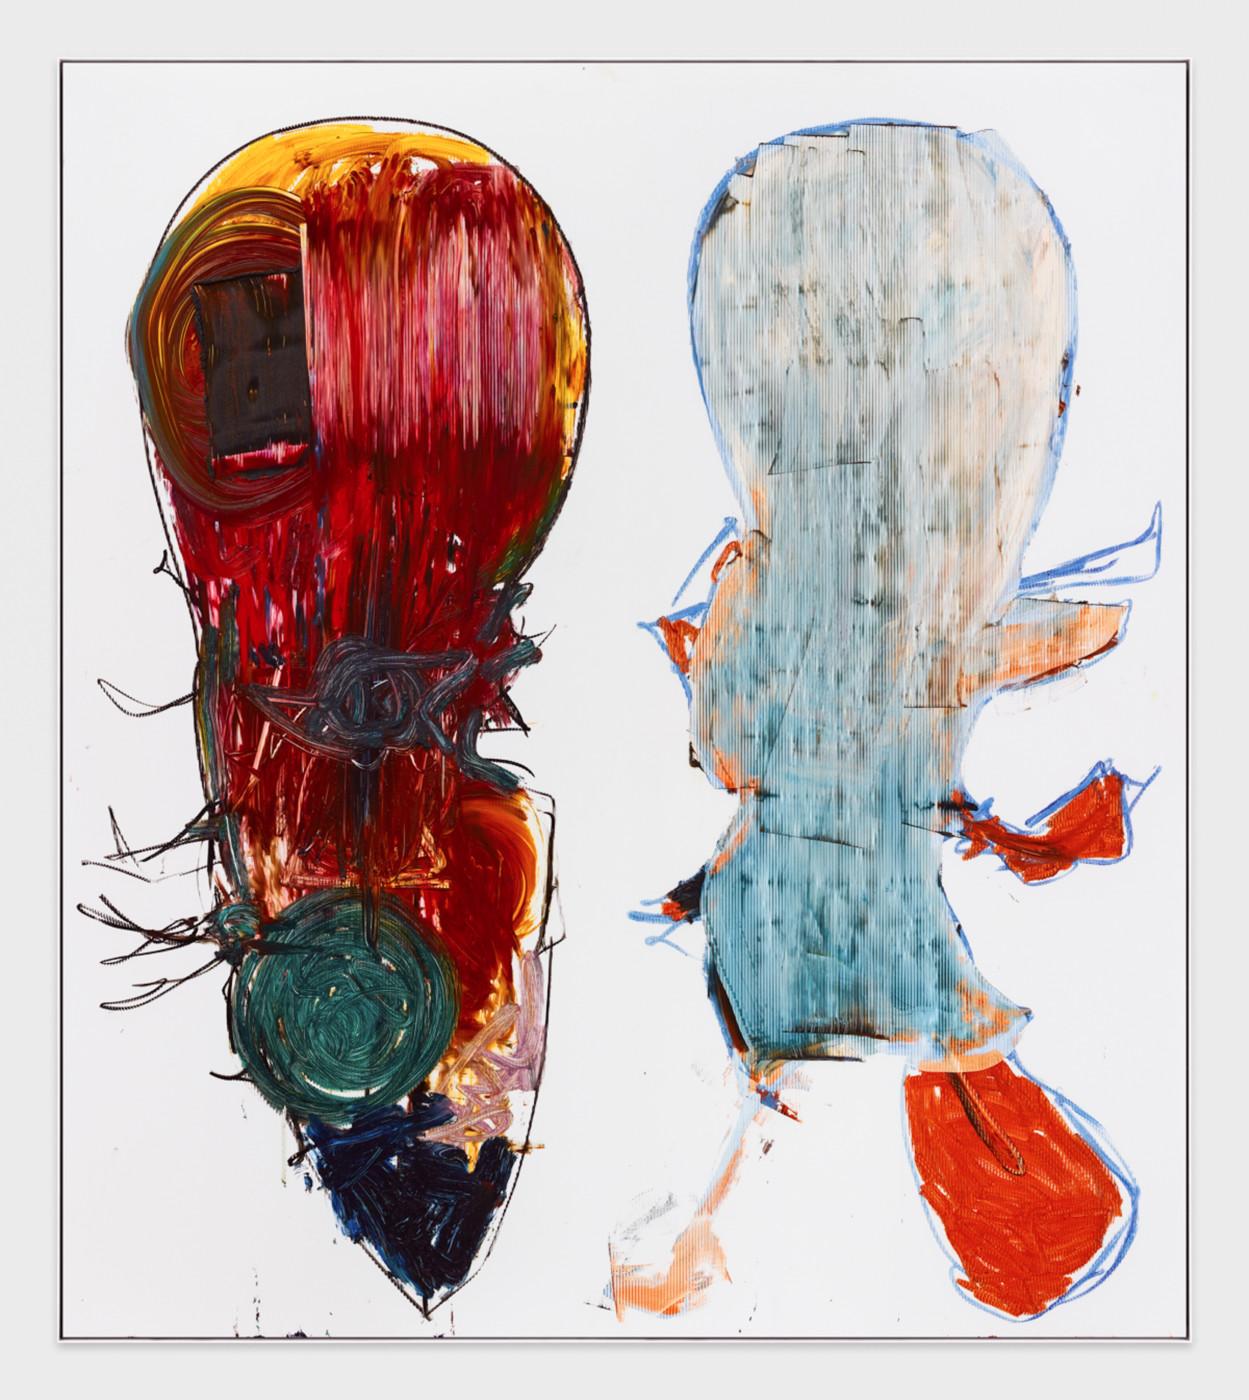 AARON  GARBER-MAIKOVSKA  DAUGHTER DUO 2 , 2019 Oil on fluted polyboard 231.7 × 205.7 cm / 91.25 × 80.9 in - High Art Gallery Paris